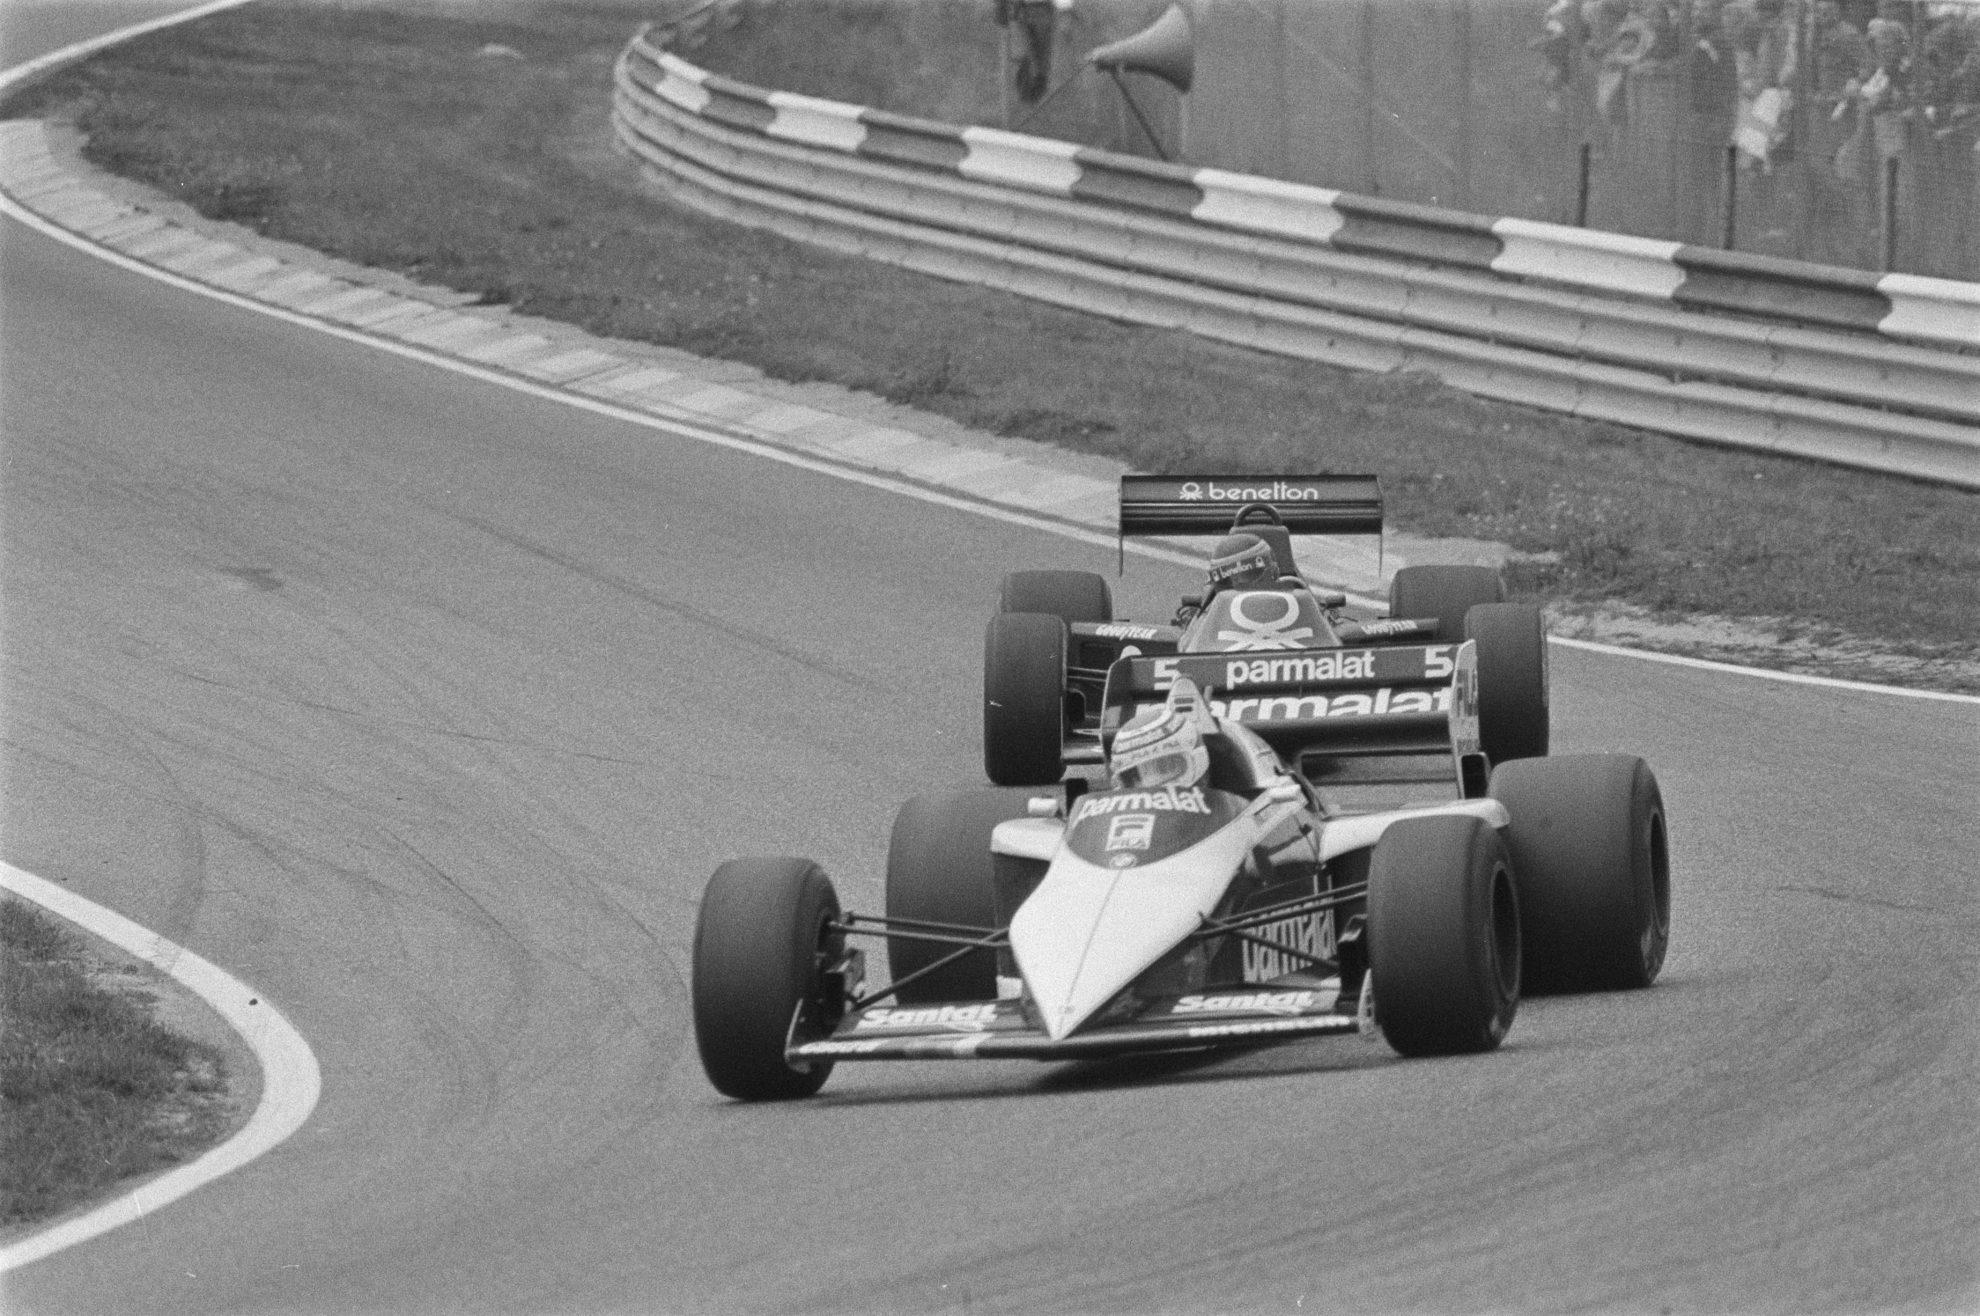 Piquet_and_Prost_at_1983_Dutch_Grand_Prix_2-e1614035645530.jpg